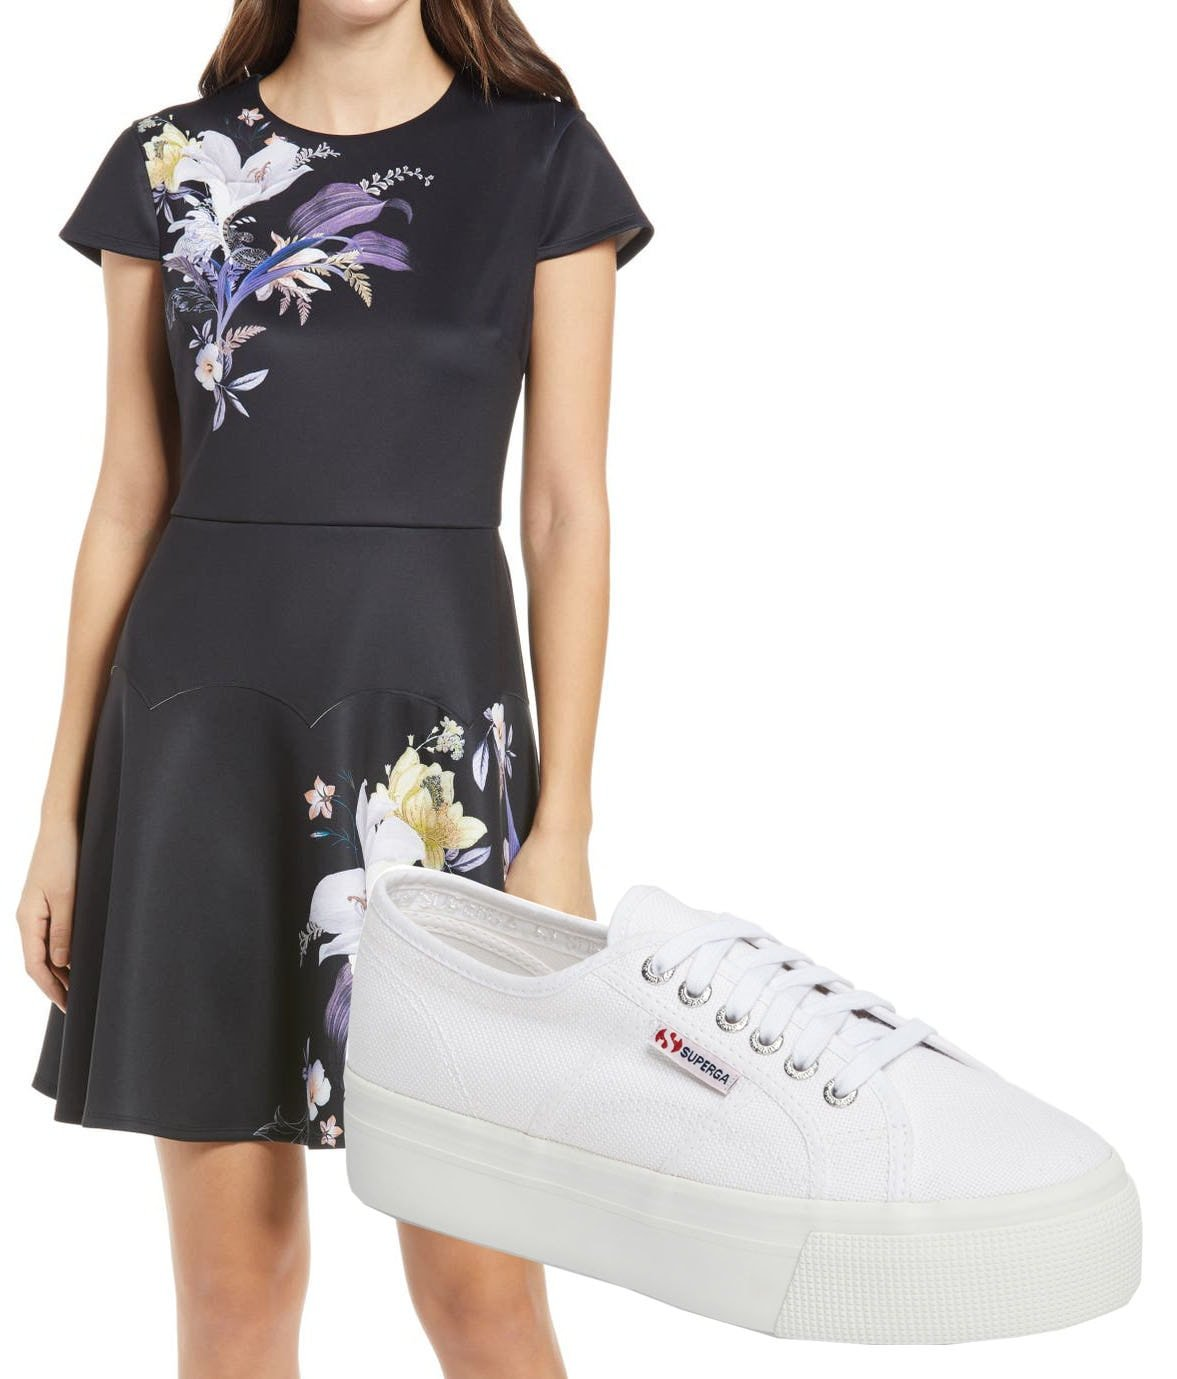 Ted Baker London Decadence Skater Dress, Superga Acot Linea Platform Sneakers